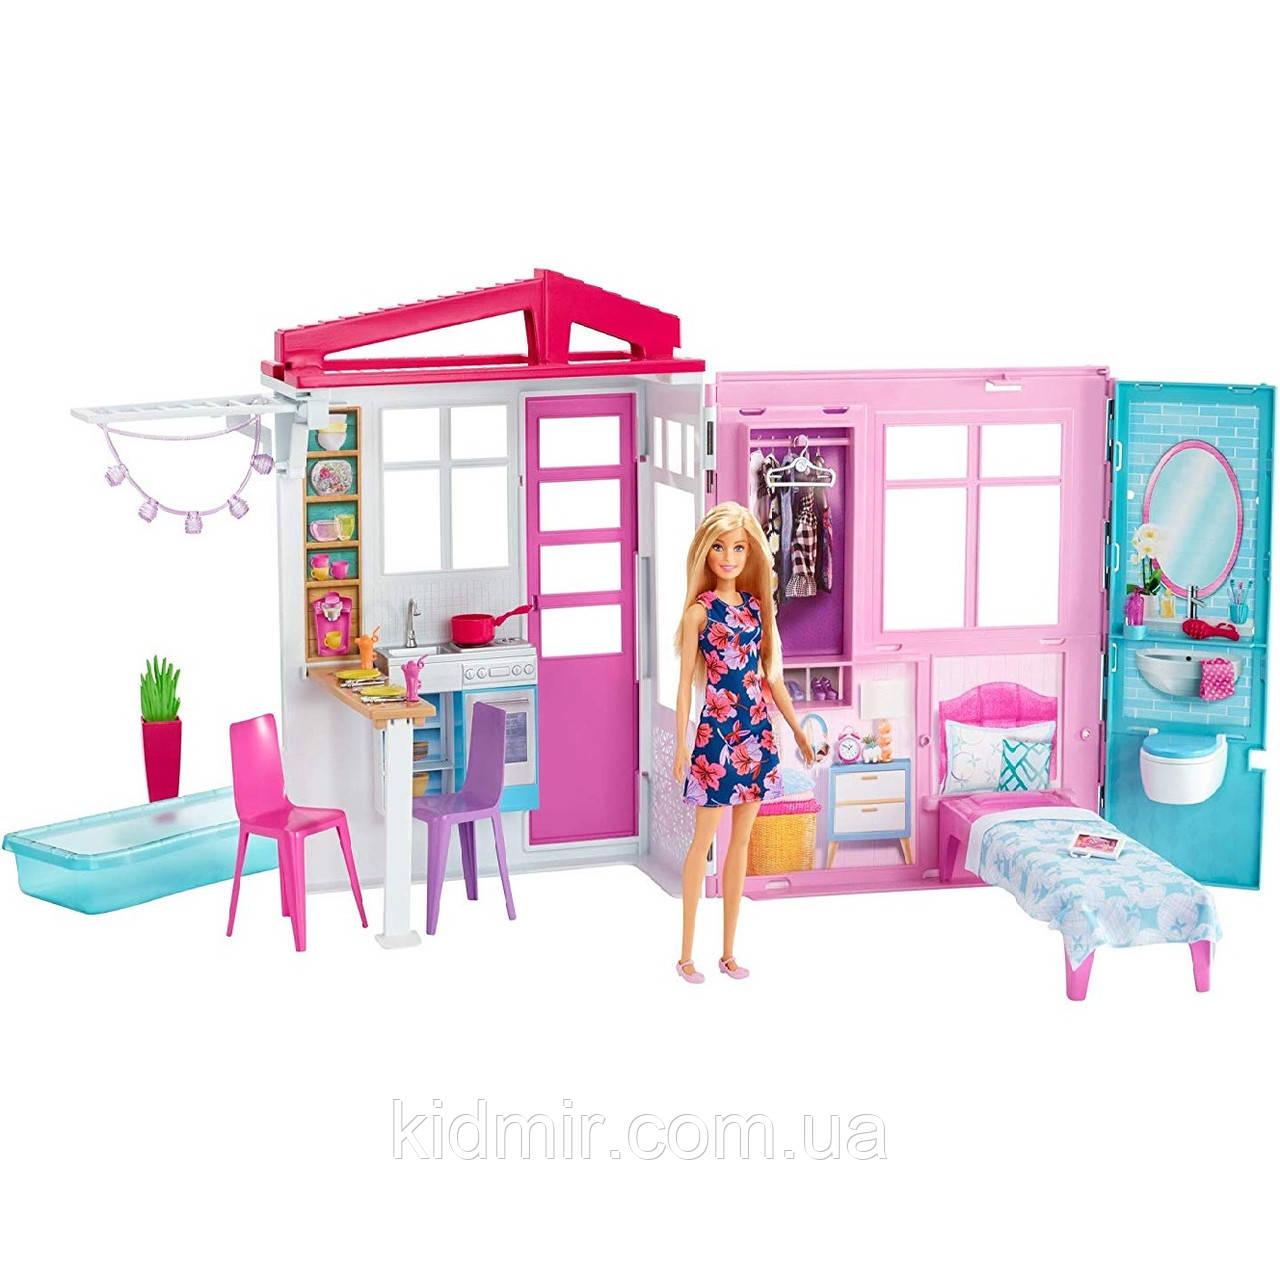 Домик Барби с басейном Barbie Doll House Playset FXG55